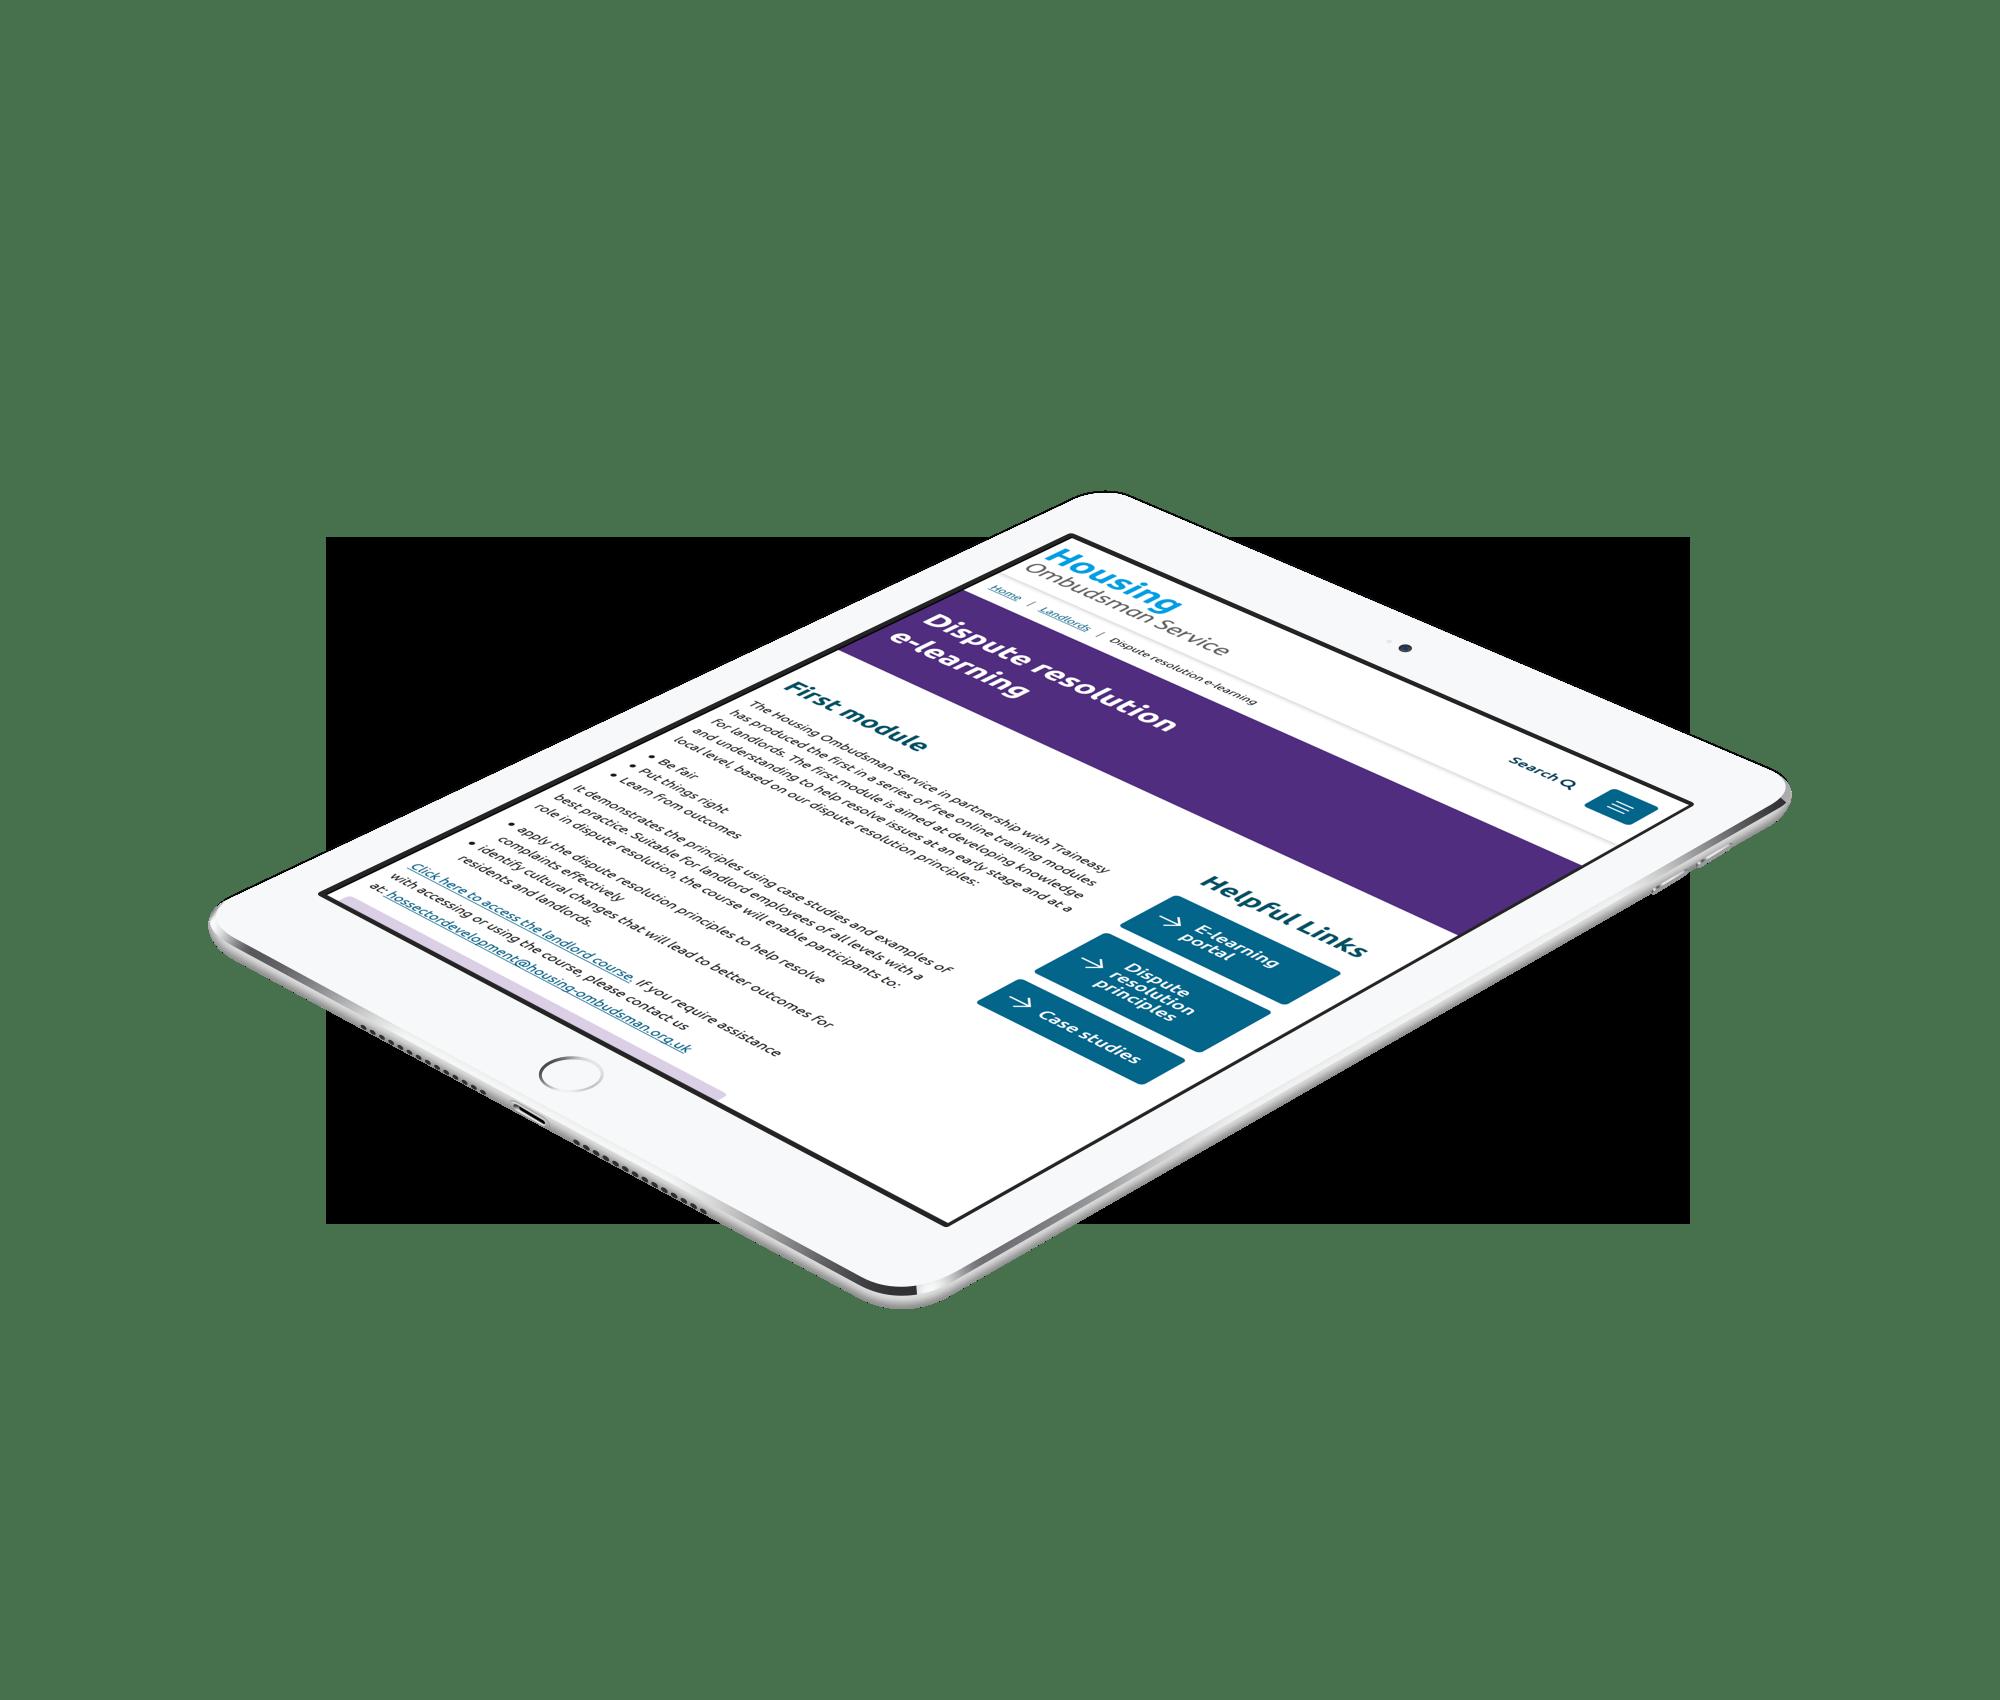 Housing Ombudsman e-learning website displayed on iPad